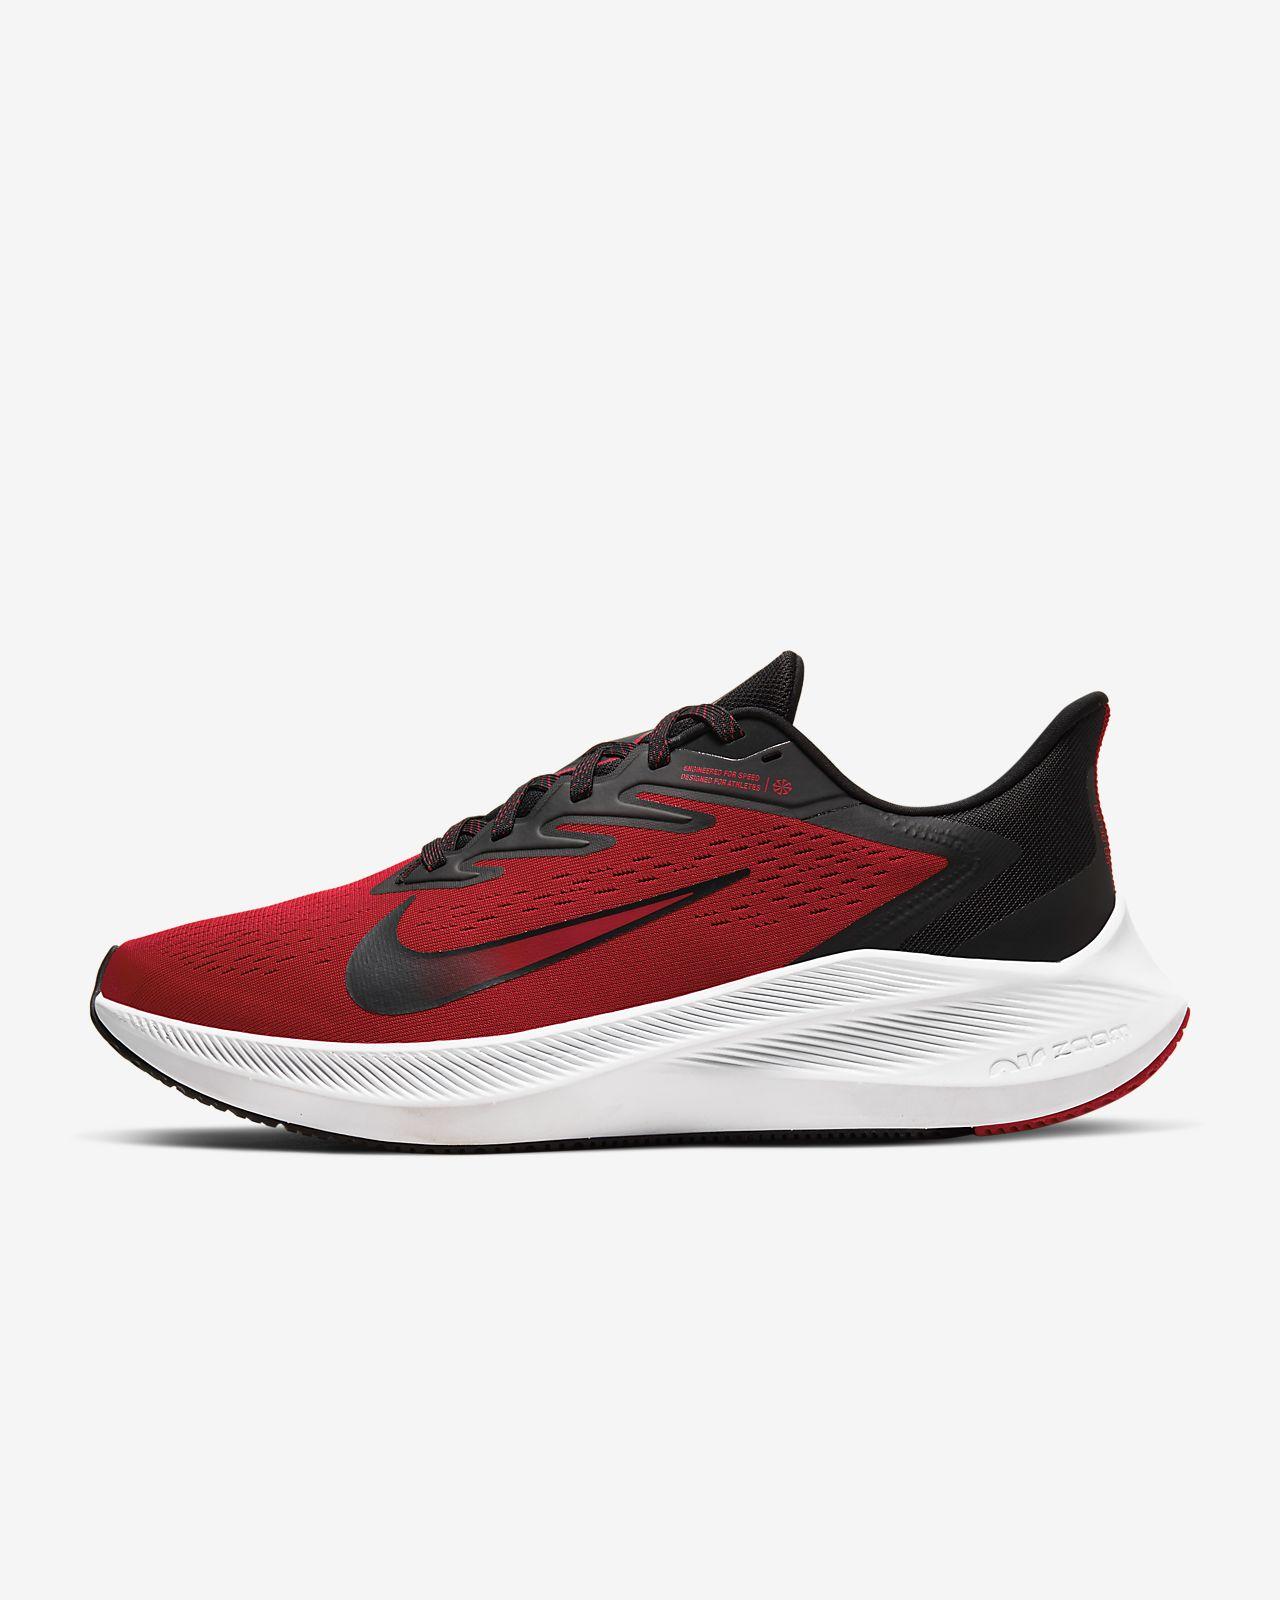 Nike Zoom Winflo 7 (Extra Wide) Men's Running Shoe